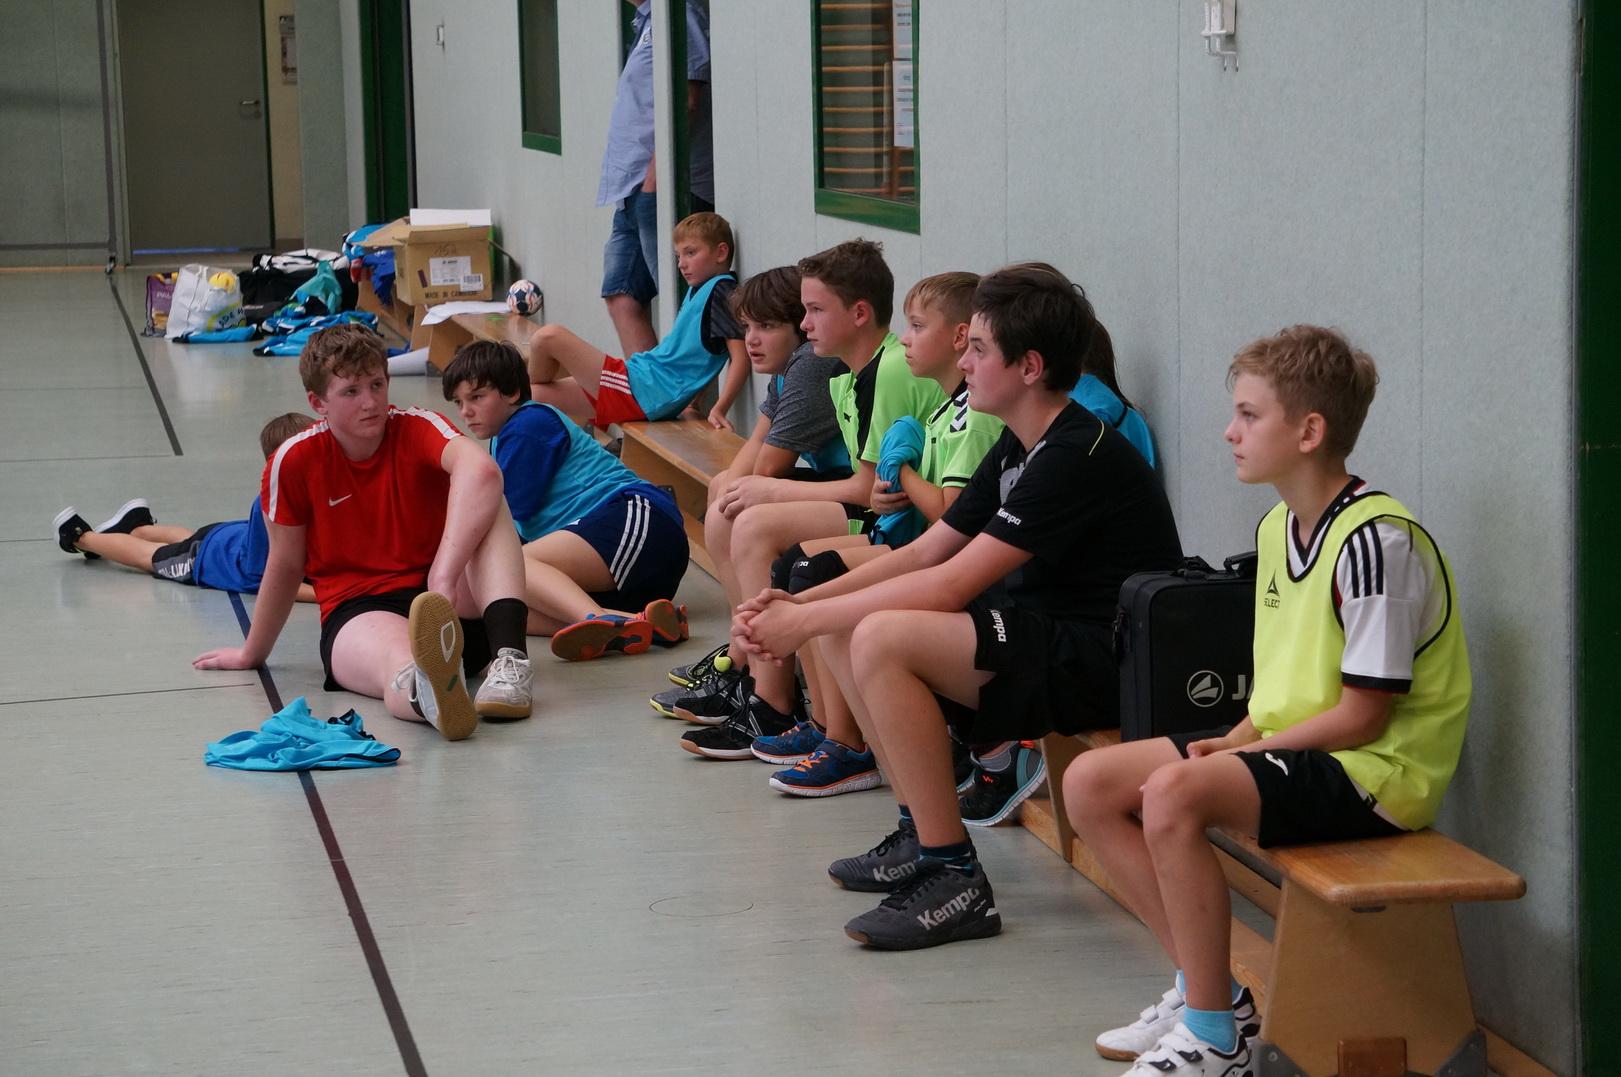 201808_Handballcamp_SDH_MG_120w